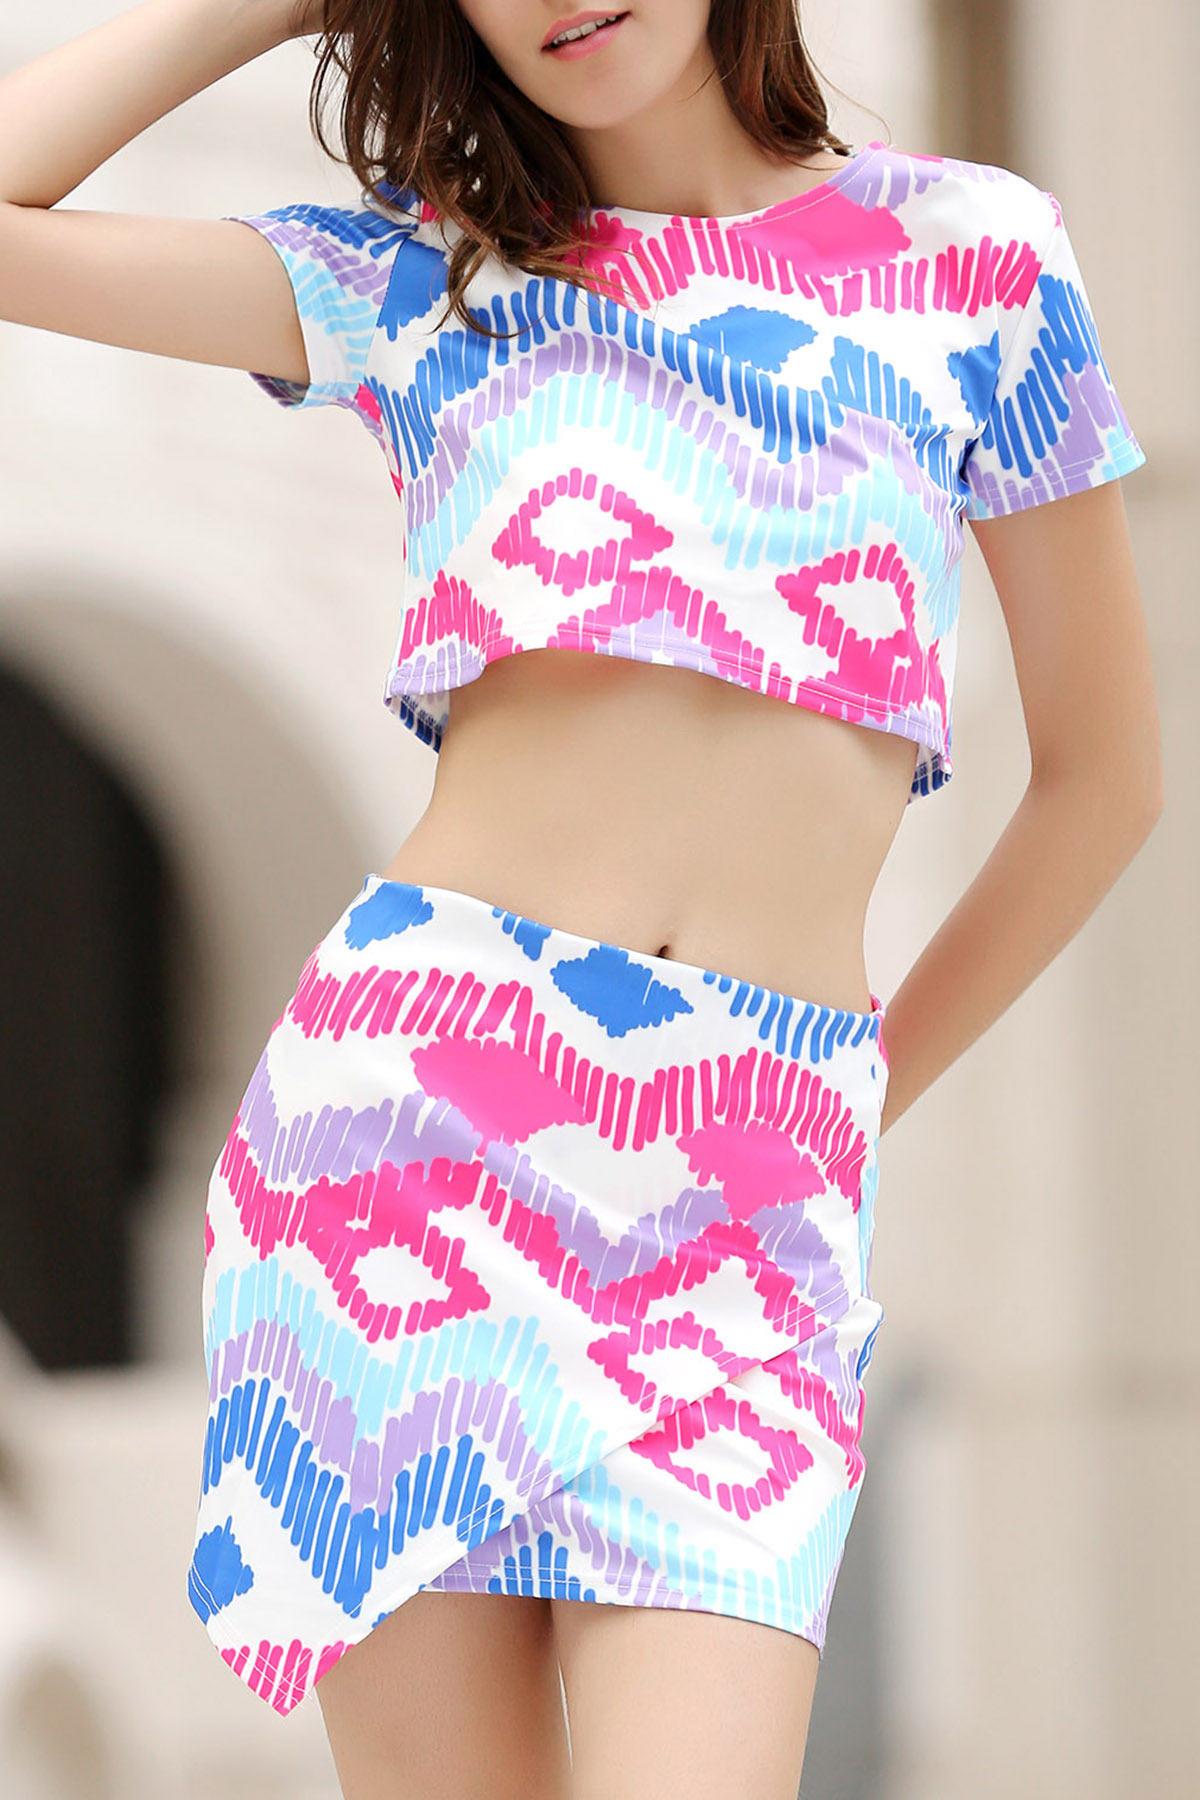 Argyle Print Short Sleeve Crop Top and Mini Skirt SuitClothes<br><br><br>Size: S<br>Color: COLORMIX